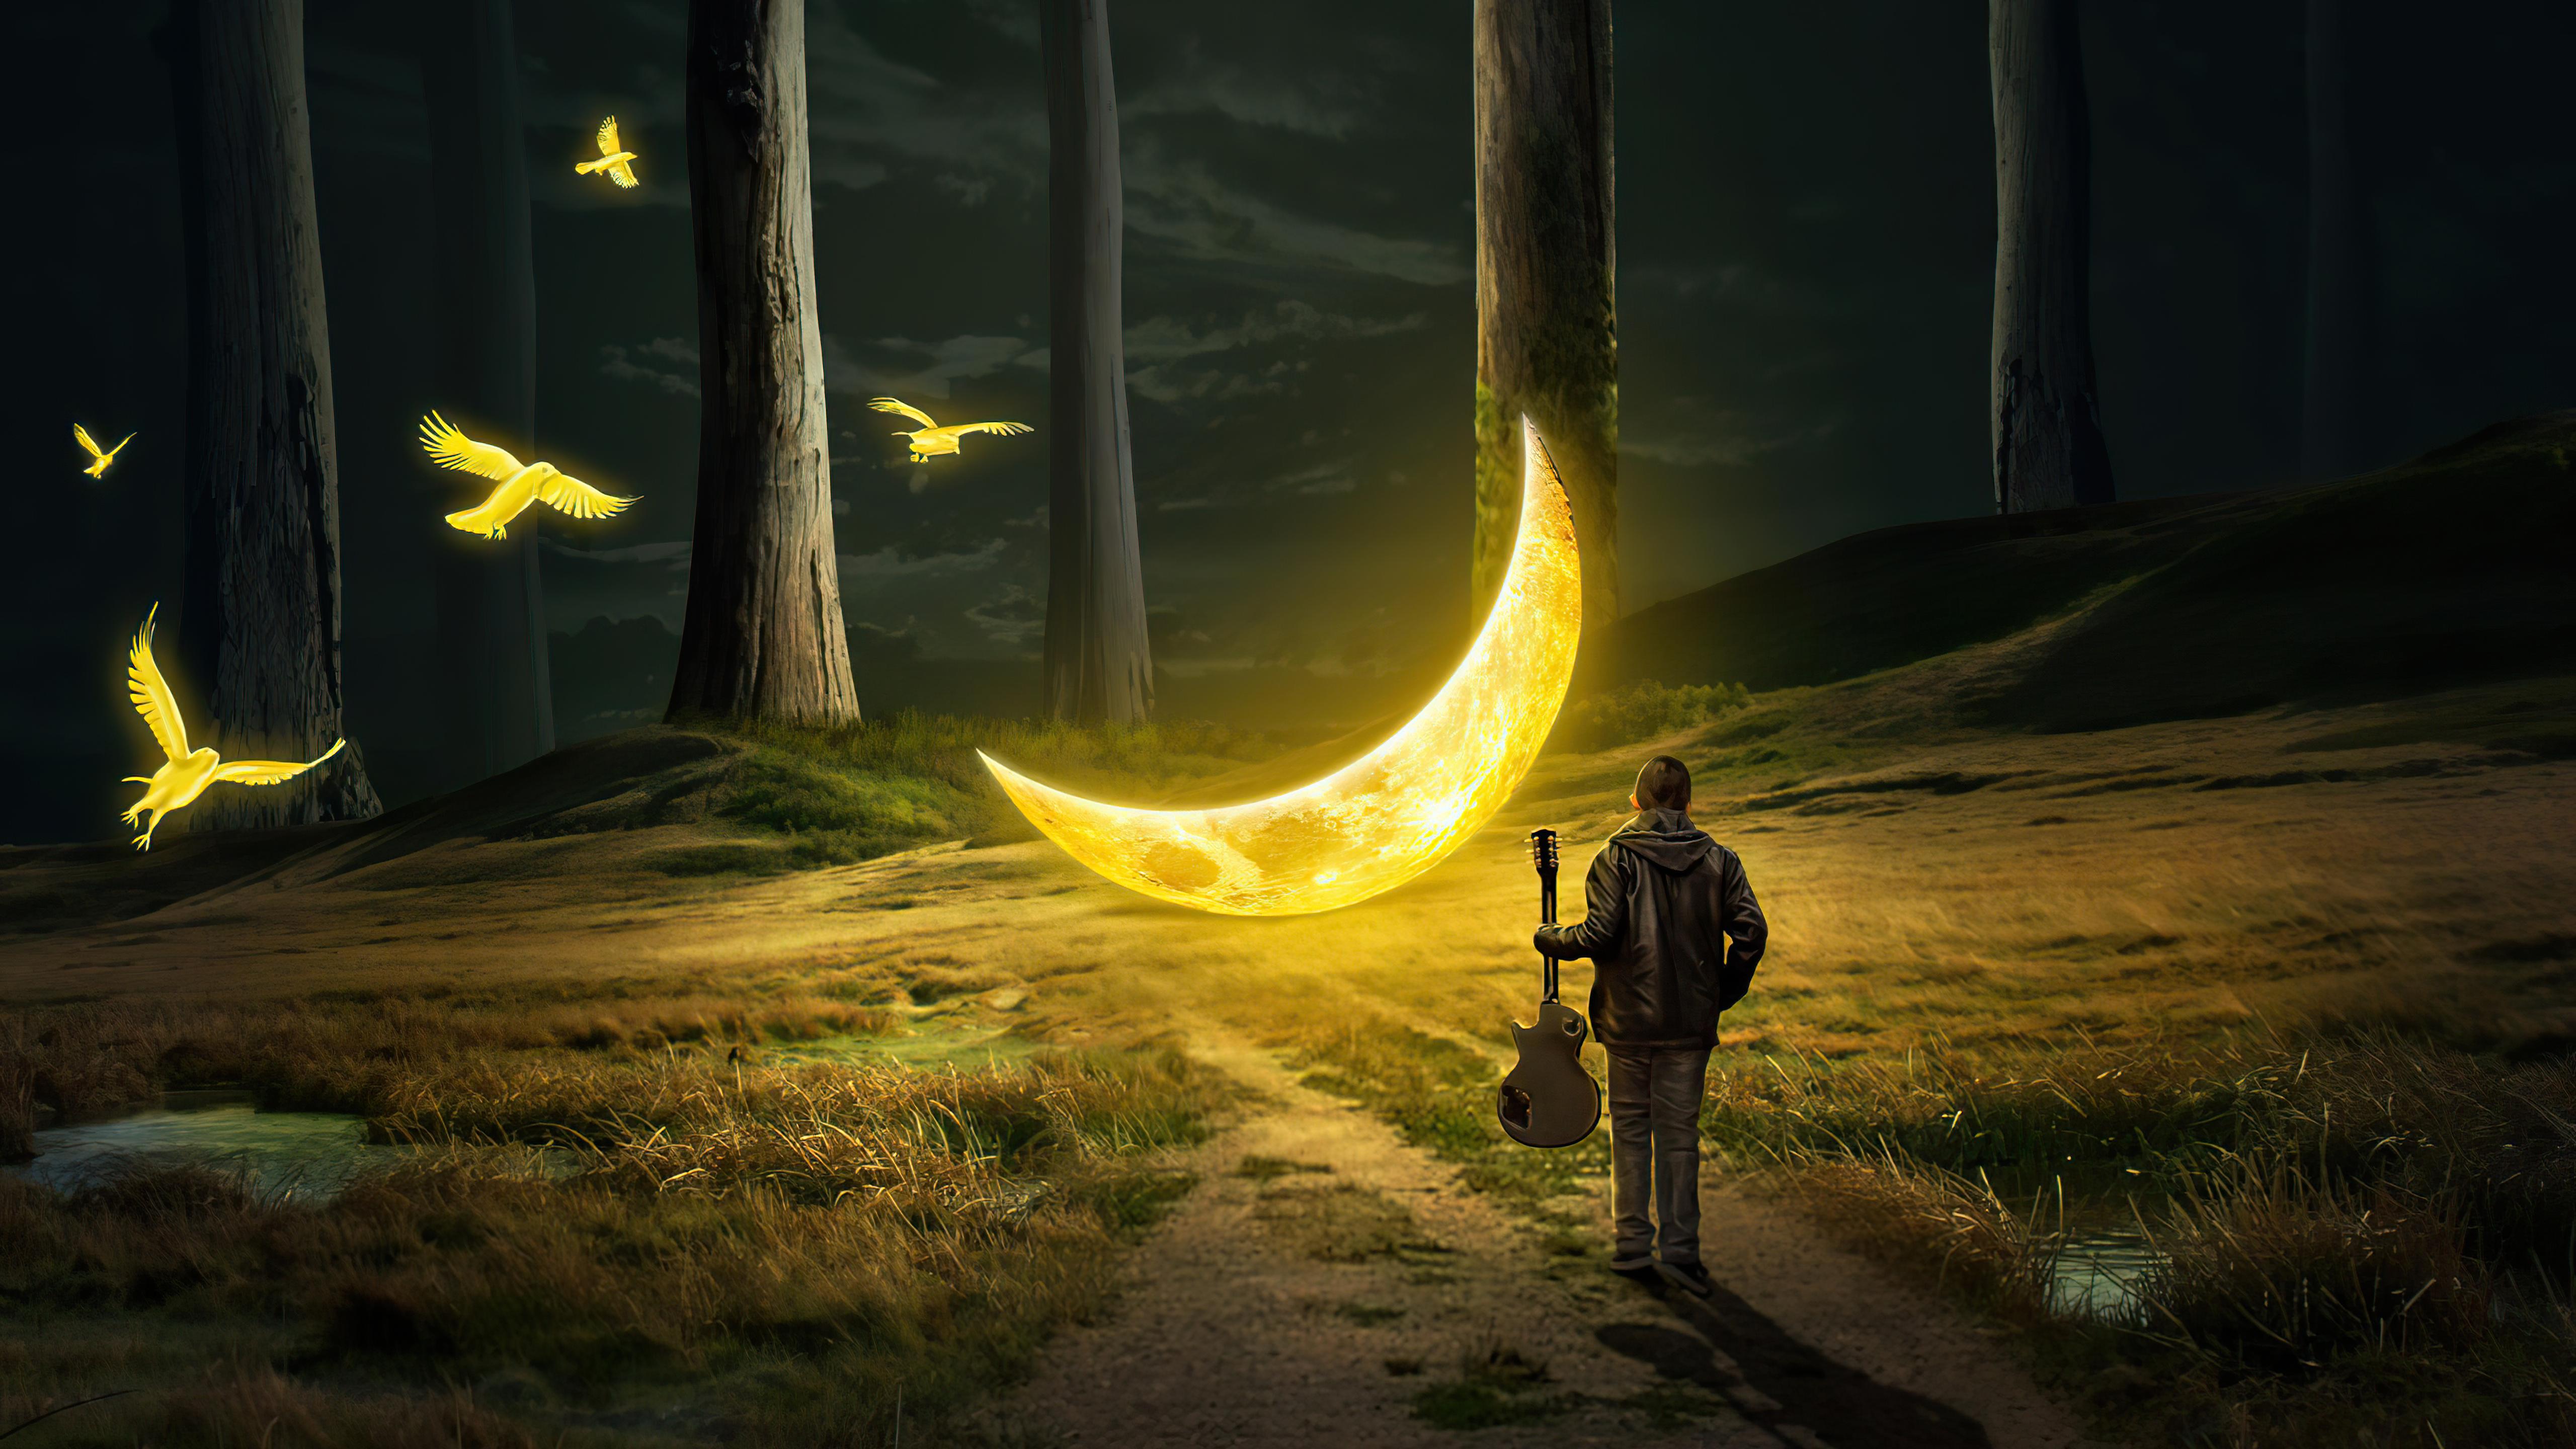 moon symphony 4k 1620166188 - Moon Symphony 4k - Moon Symphony 4k wallpapers